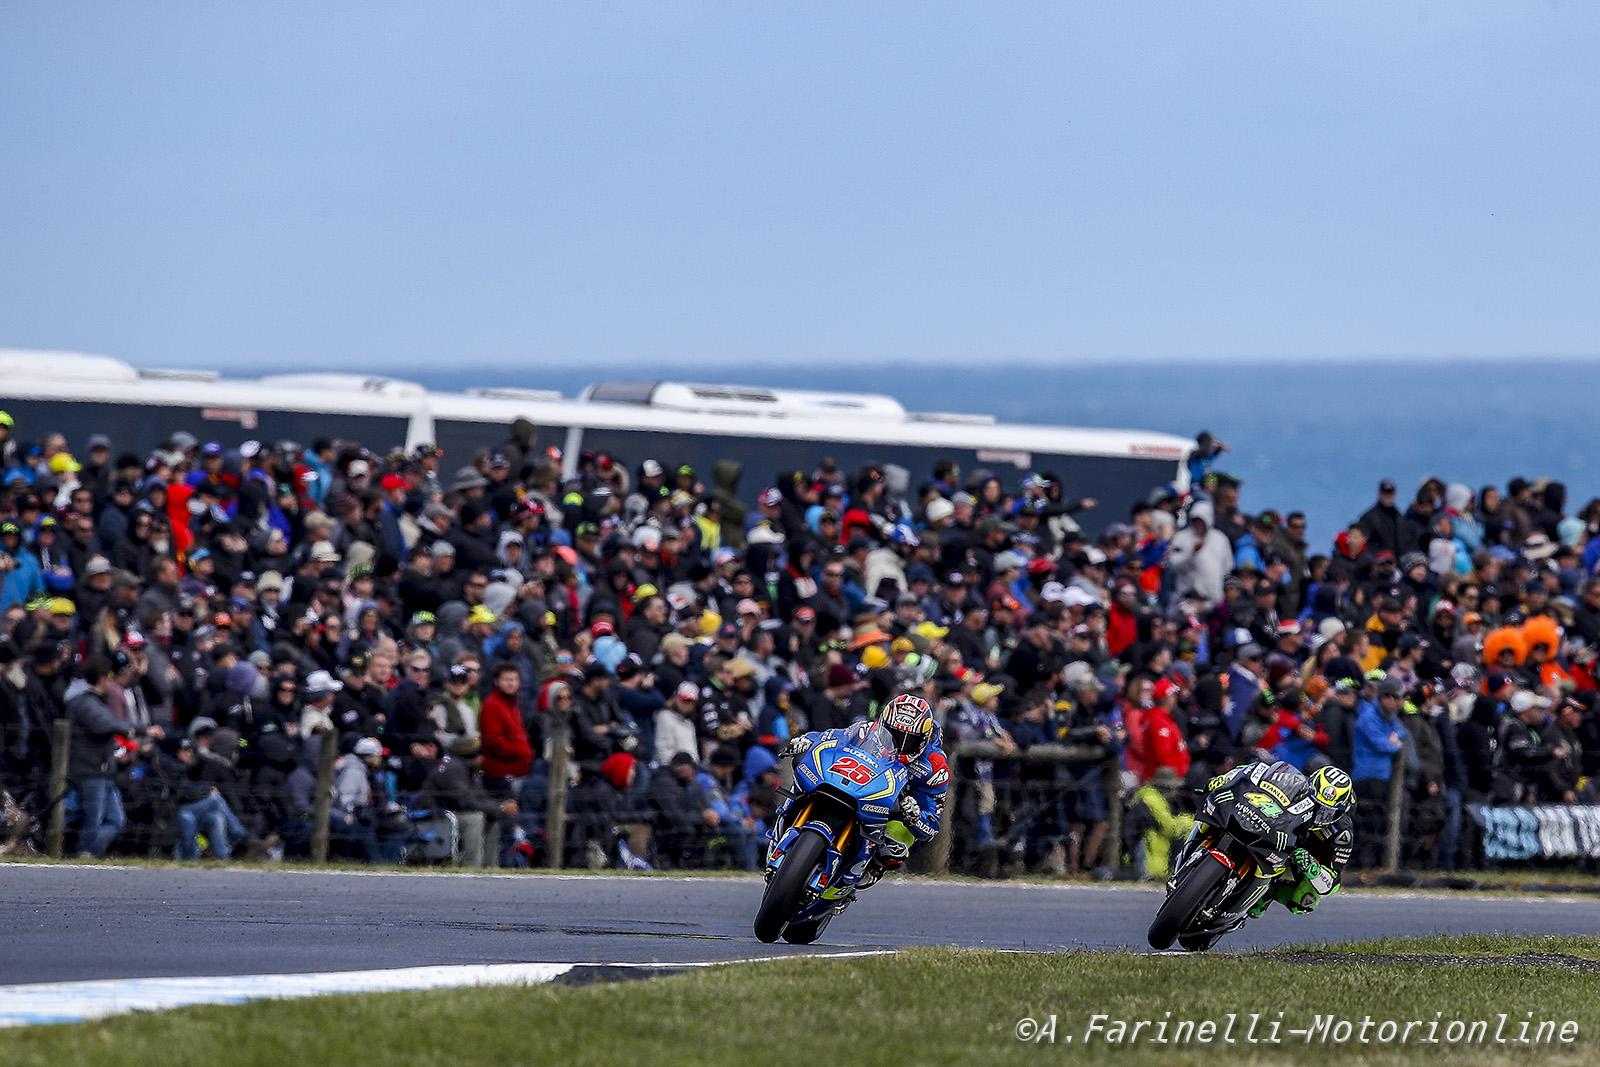 MotoGP Phillip-Island 2016RACE Foto MotoGP alta risoluzione 19 di 83